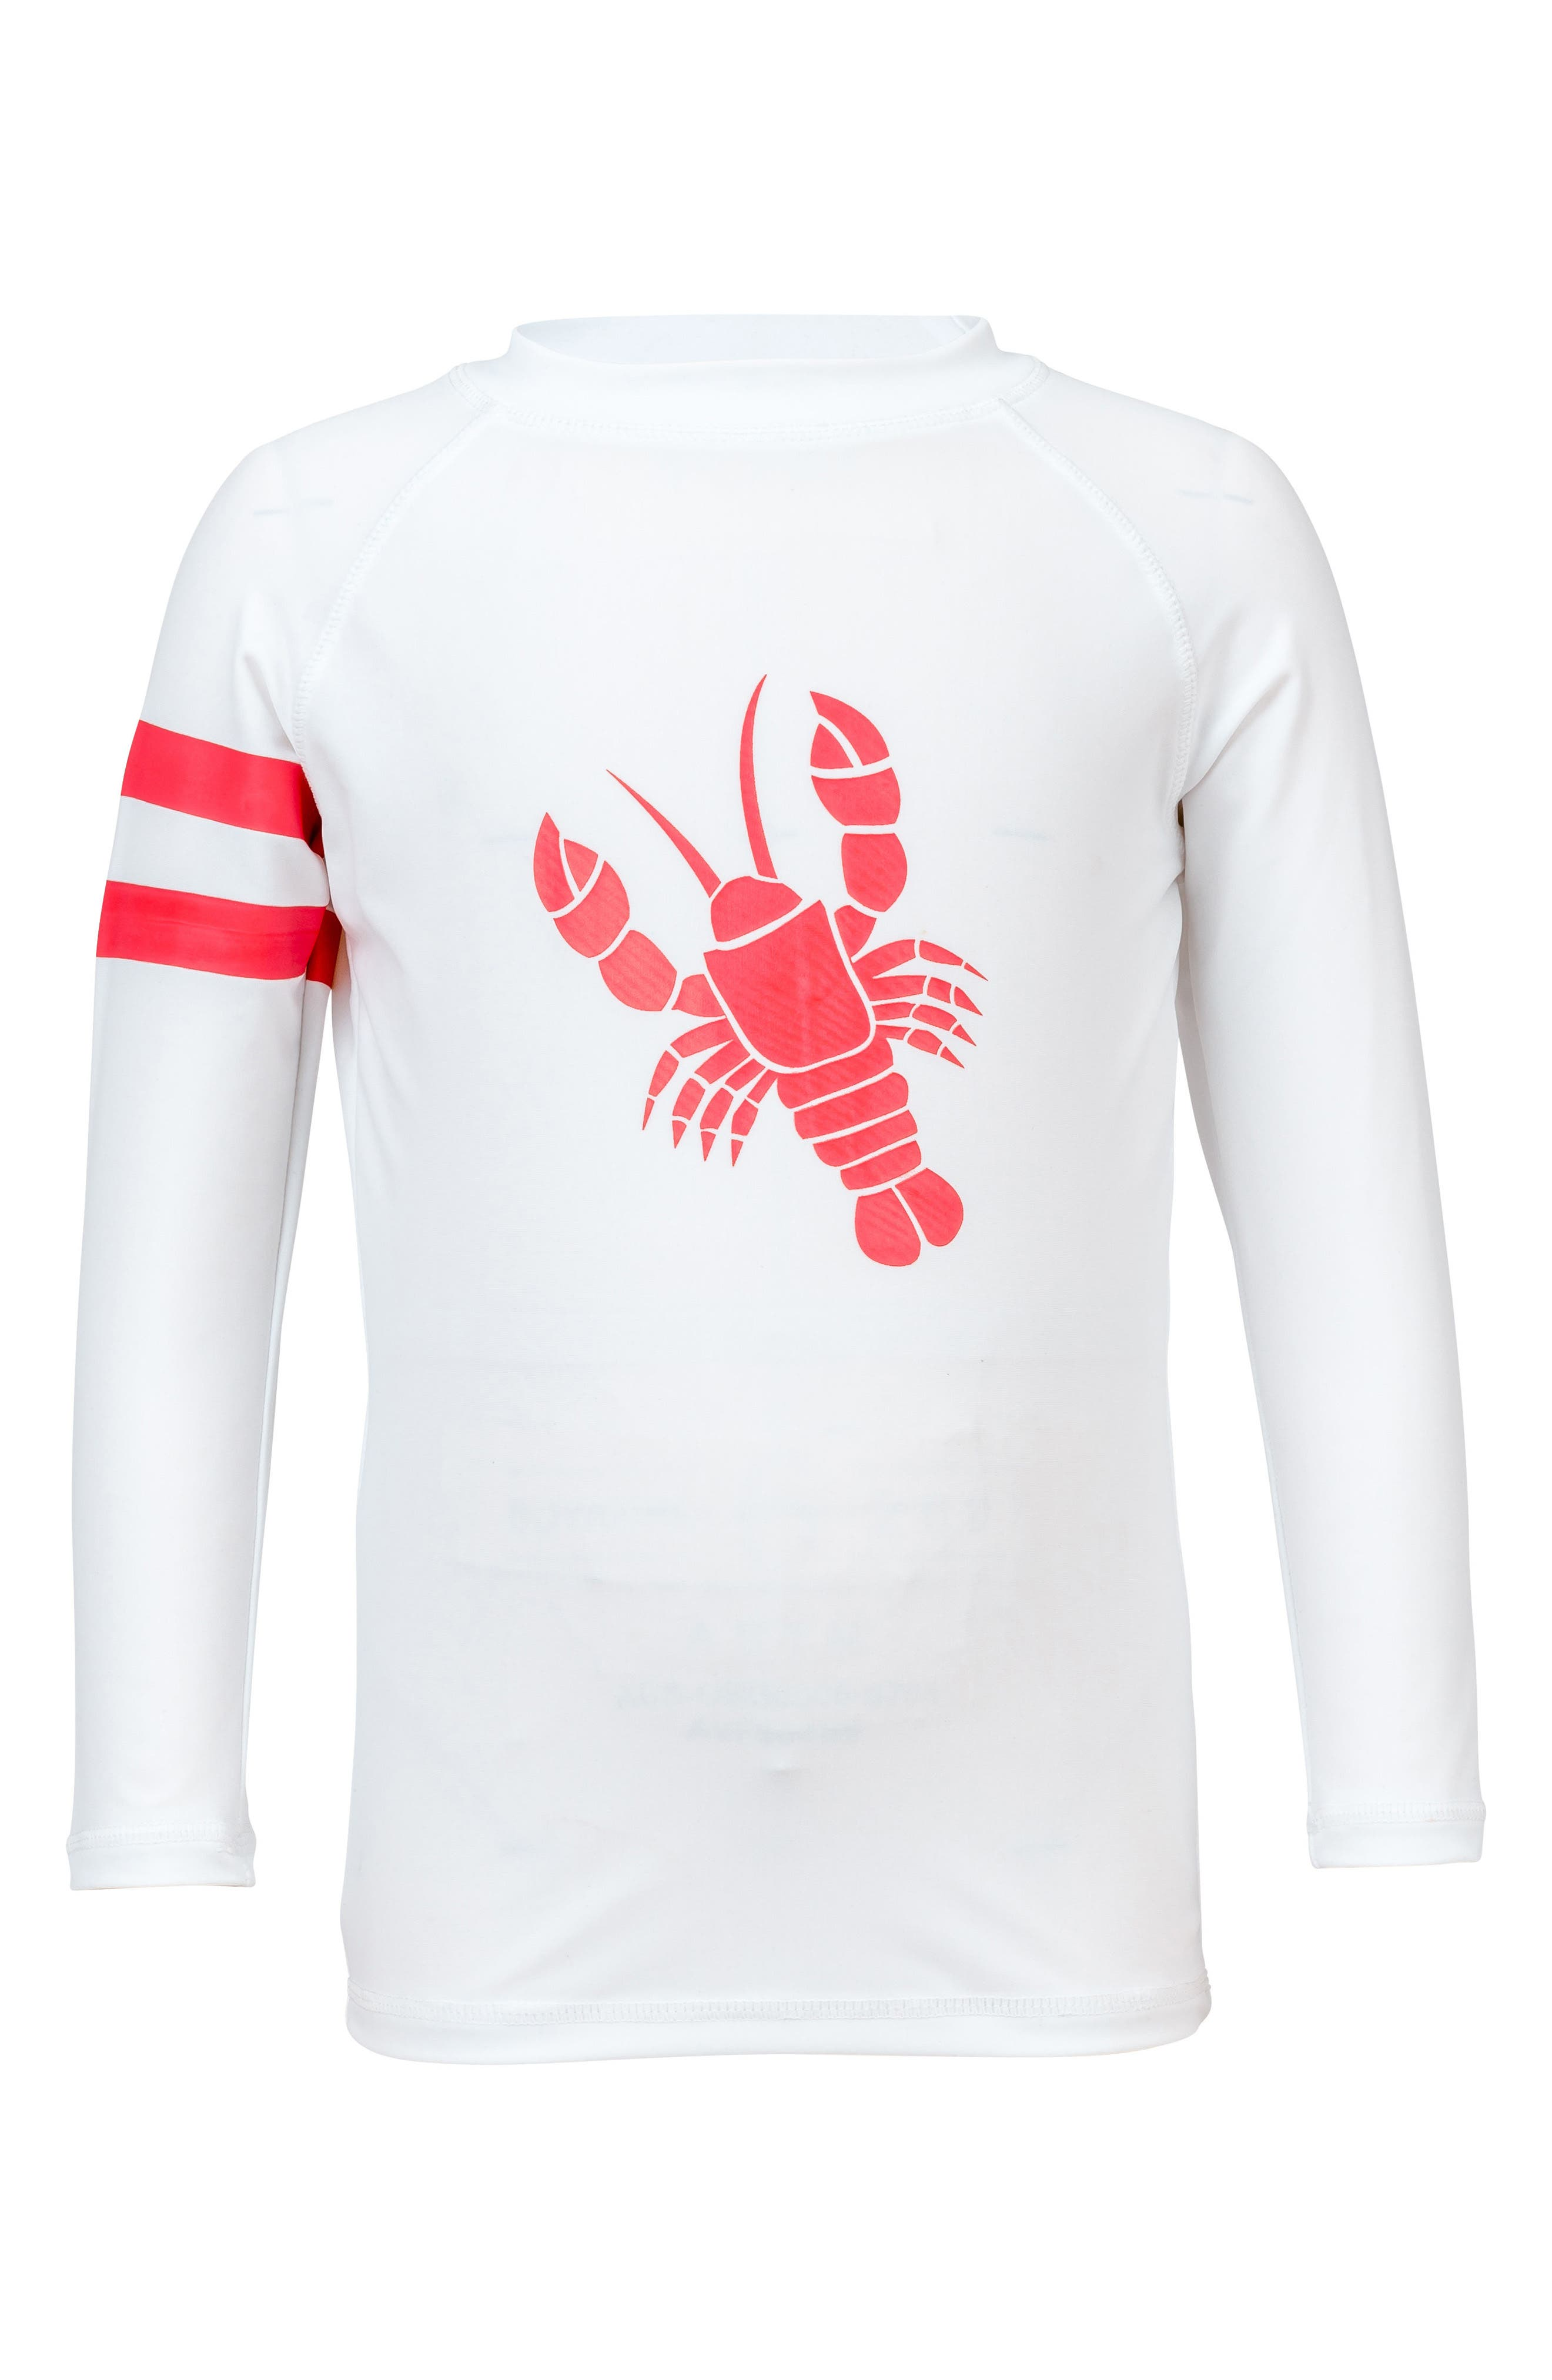 Lobster Long Sleeve Rashguard,                             Main thumbnail 1, color,                             WHITE/ RED